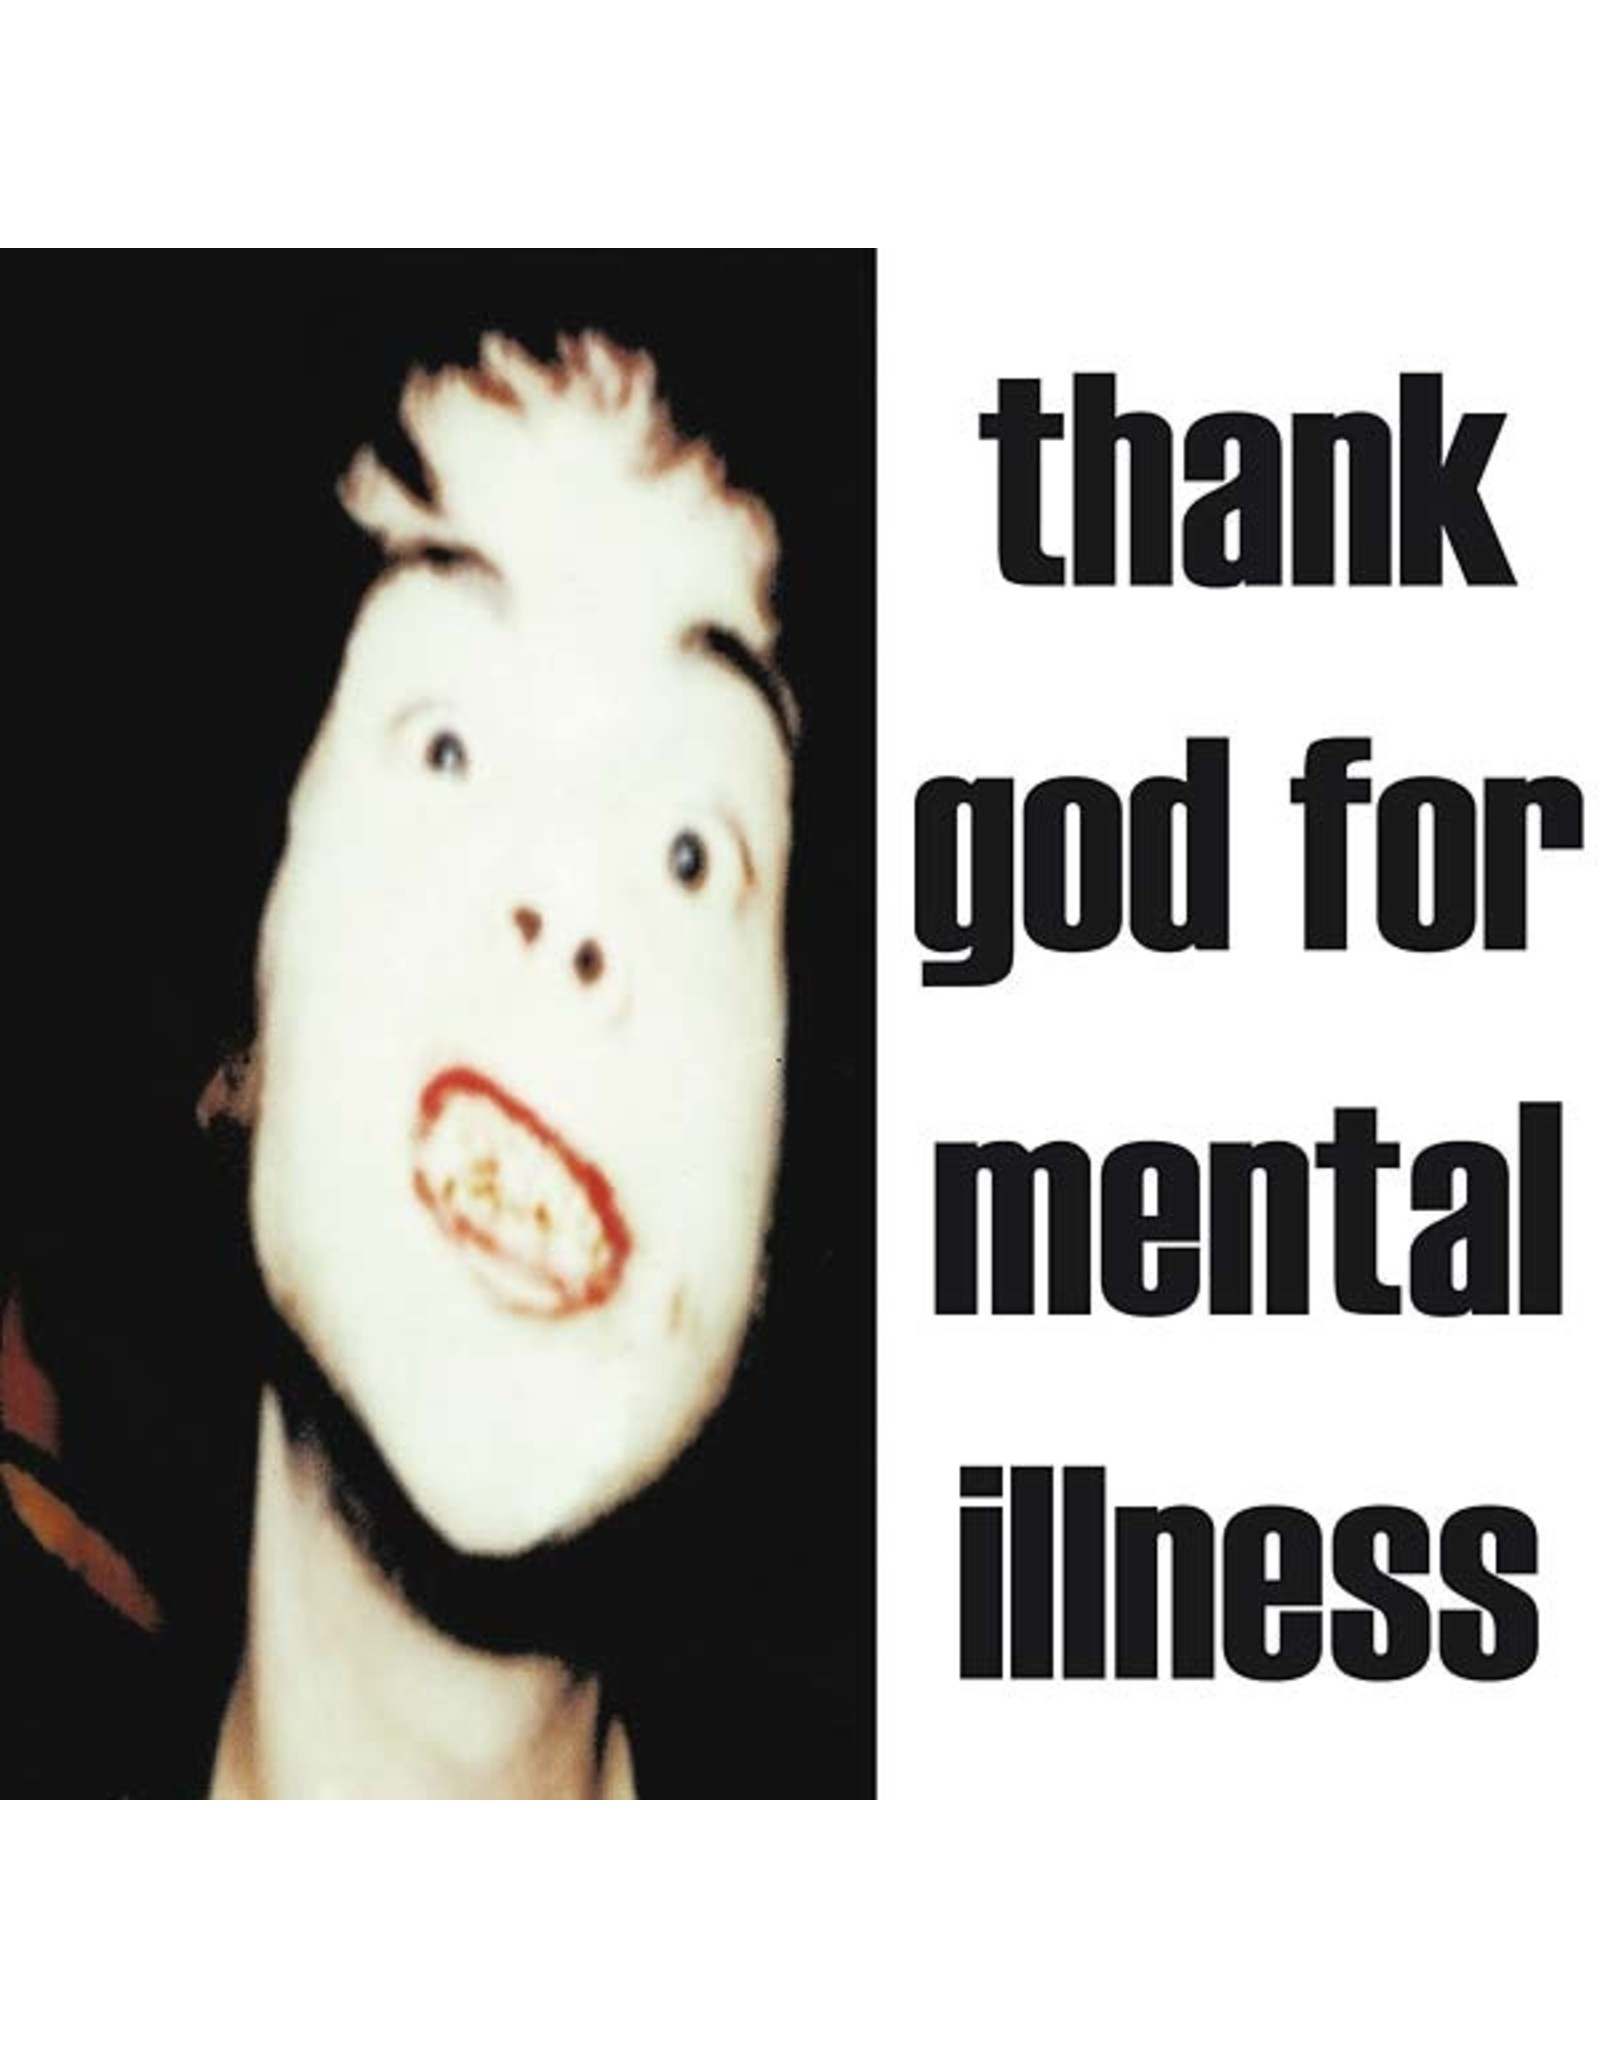 New Vinyl Brian Jonestown Massacre - Thank God For Mental Illness LP